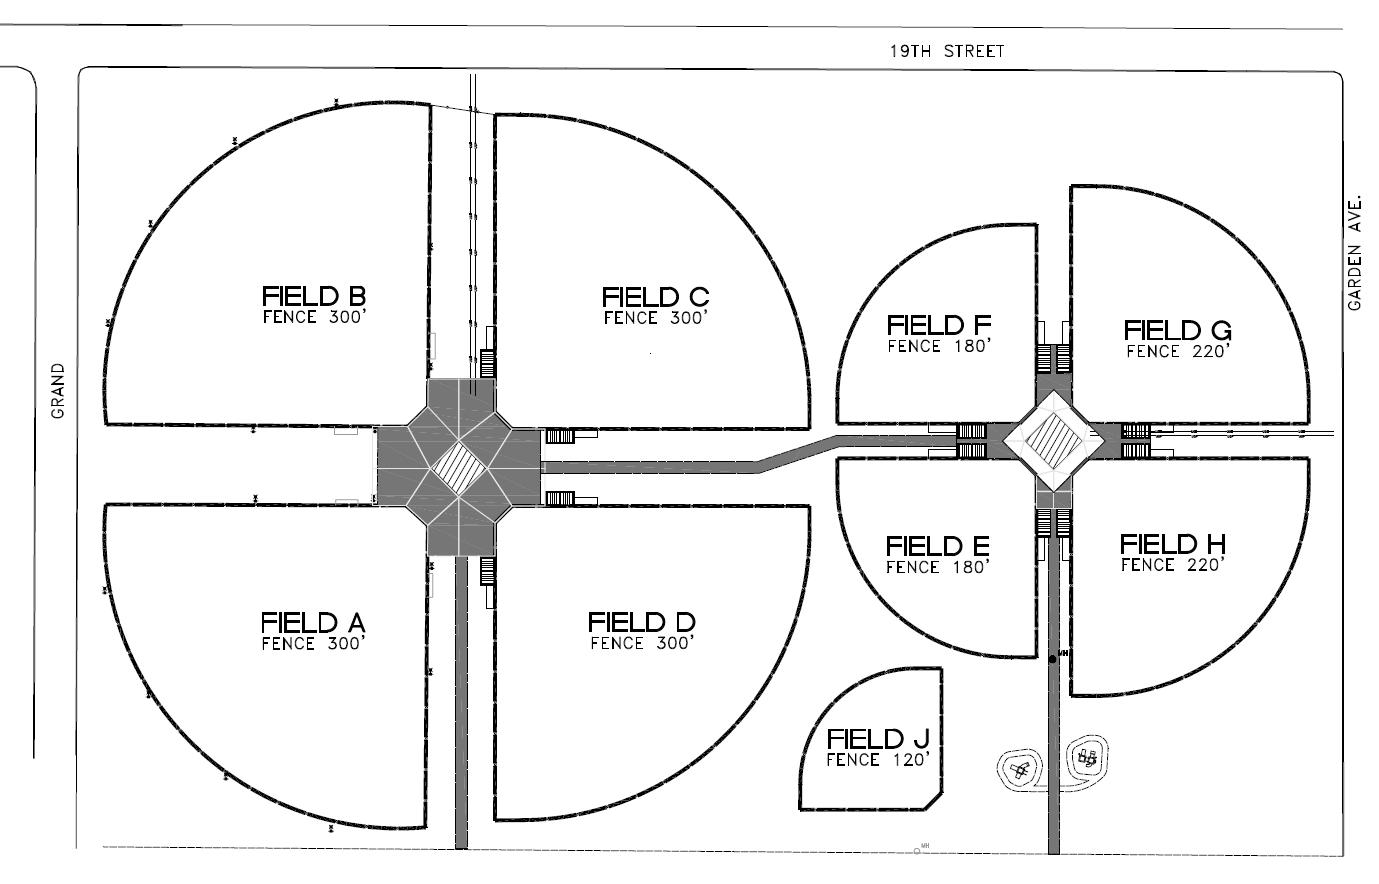 hight resolution of wool bowl site master plan 2005